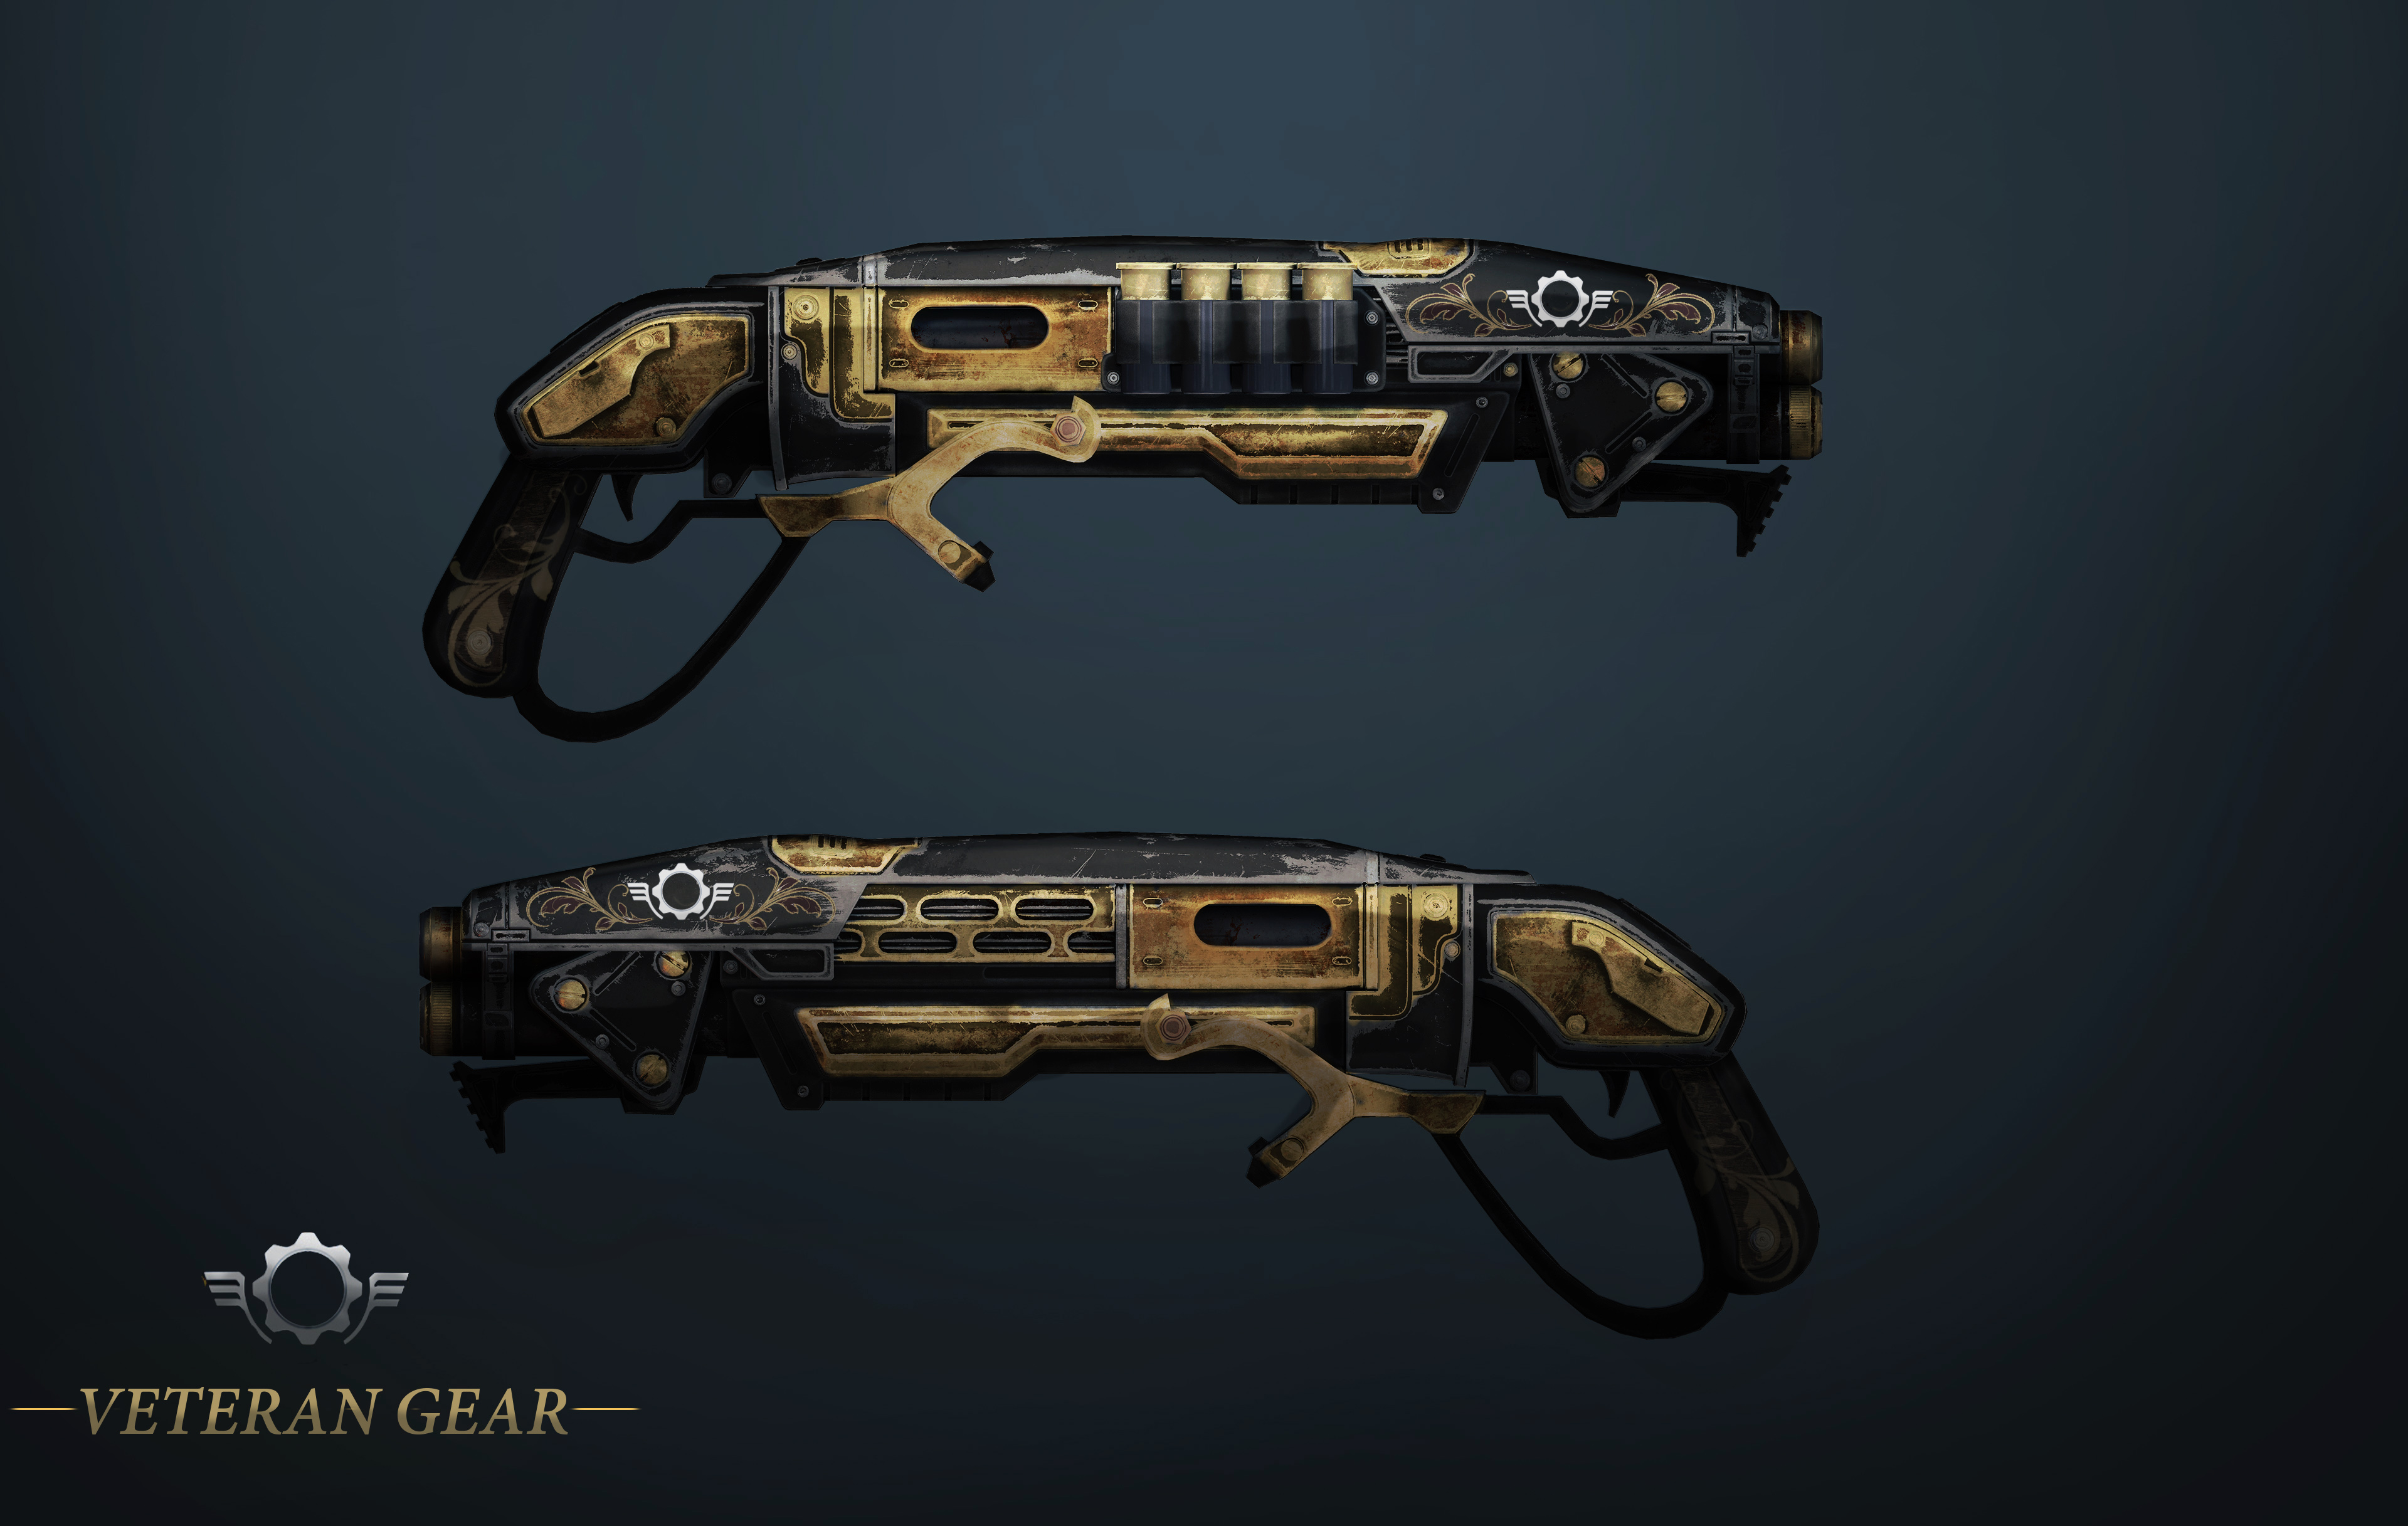 Gears Of War 4 Community Weapon Skin Competition Winners